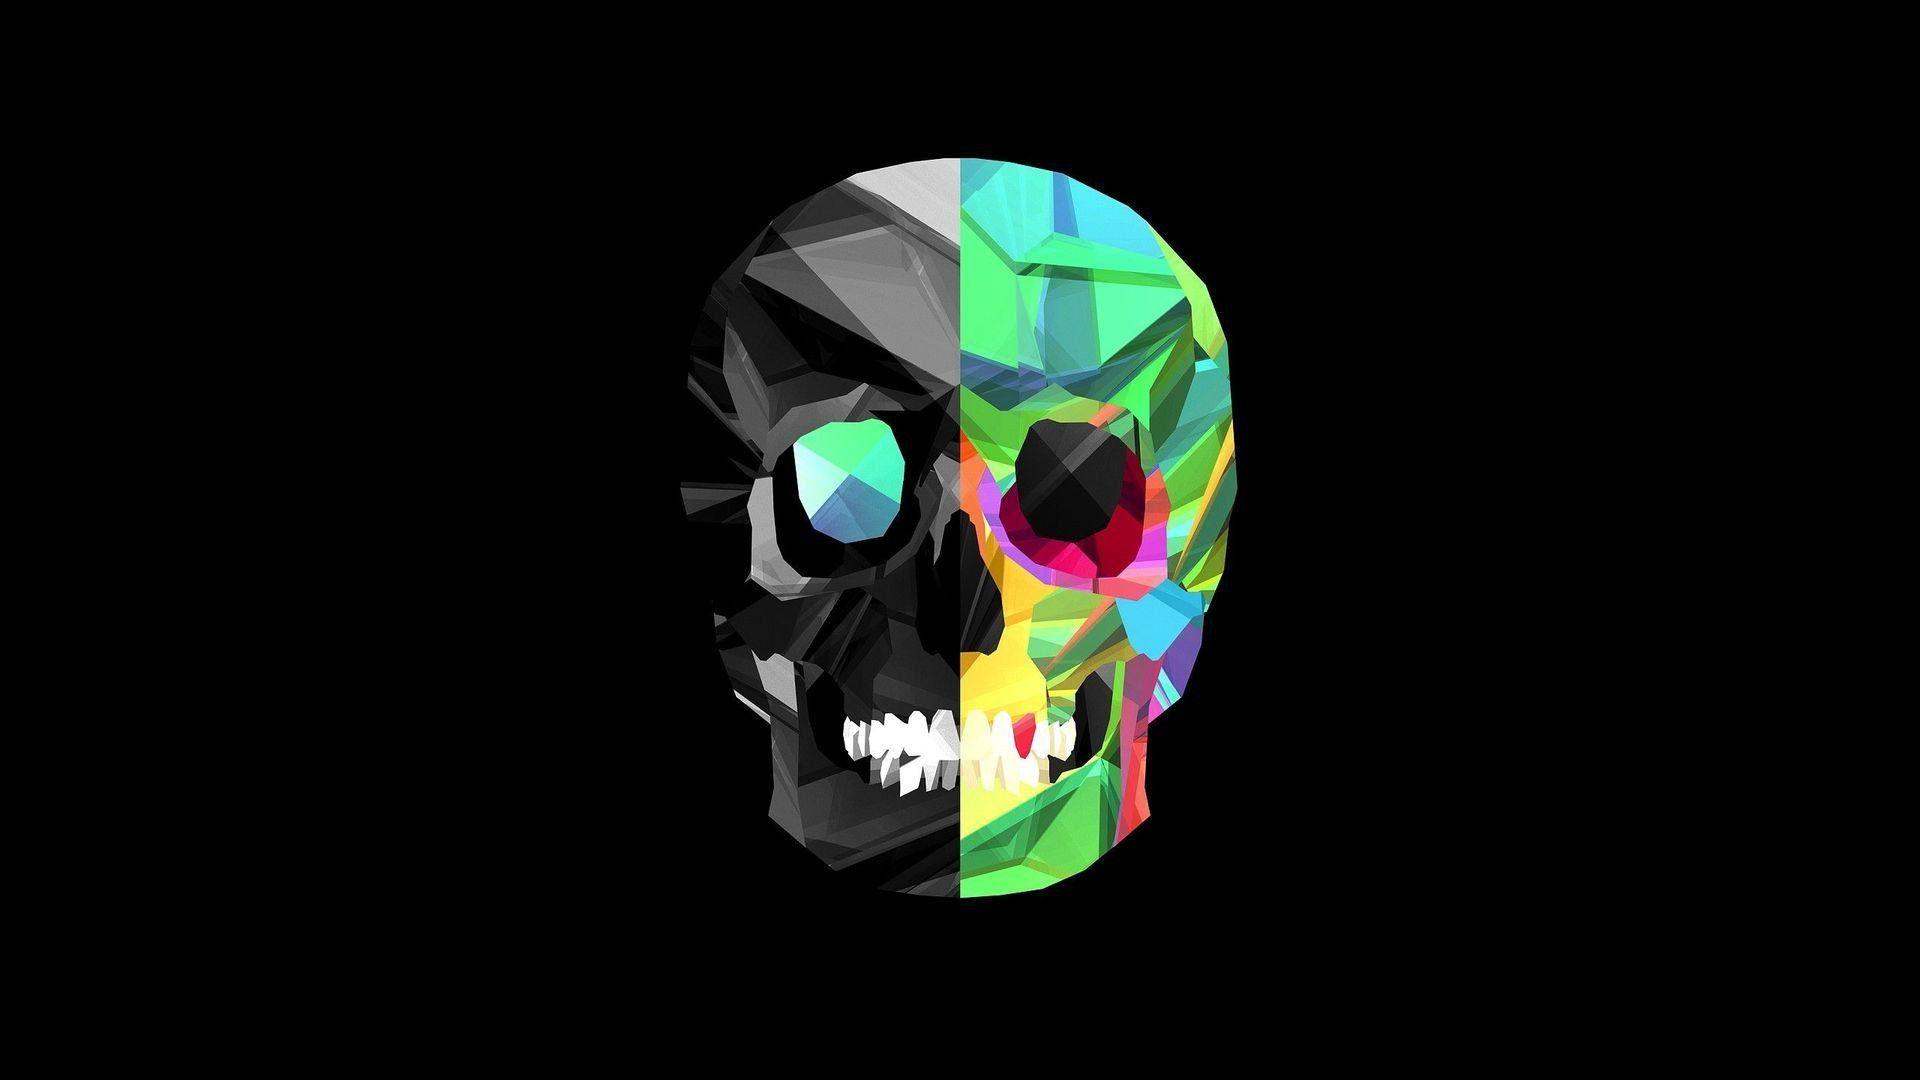 Kartinki Dlya Malchikov 36 Foto Naslazhdajtes Yumorom Skull Wallpaper Hd Skull Wallpapers Cool Desktop Wallpapers